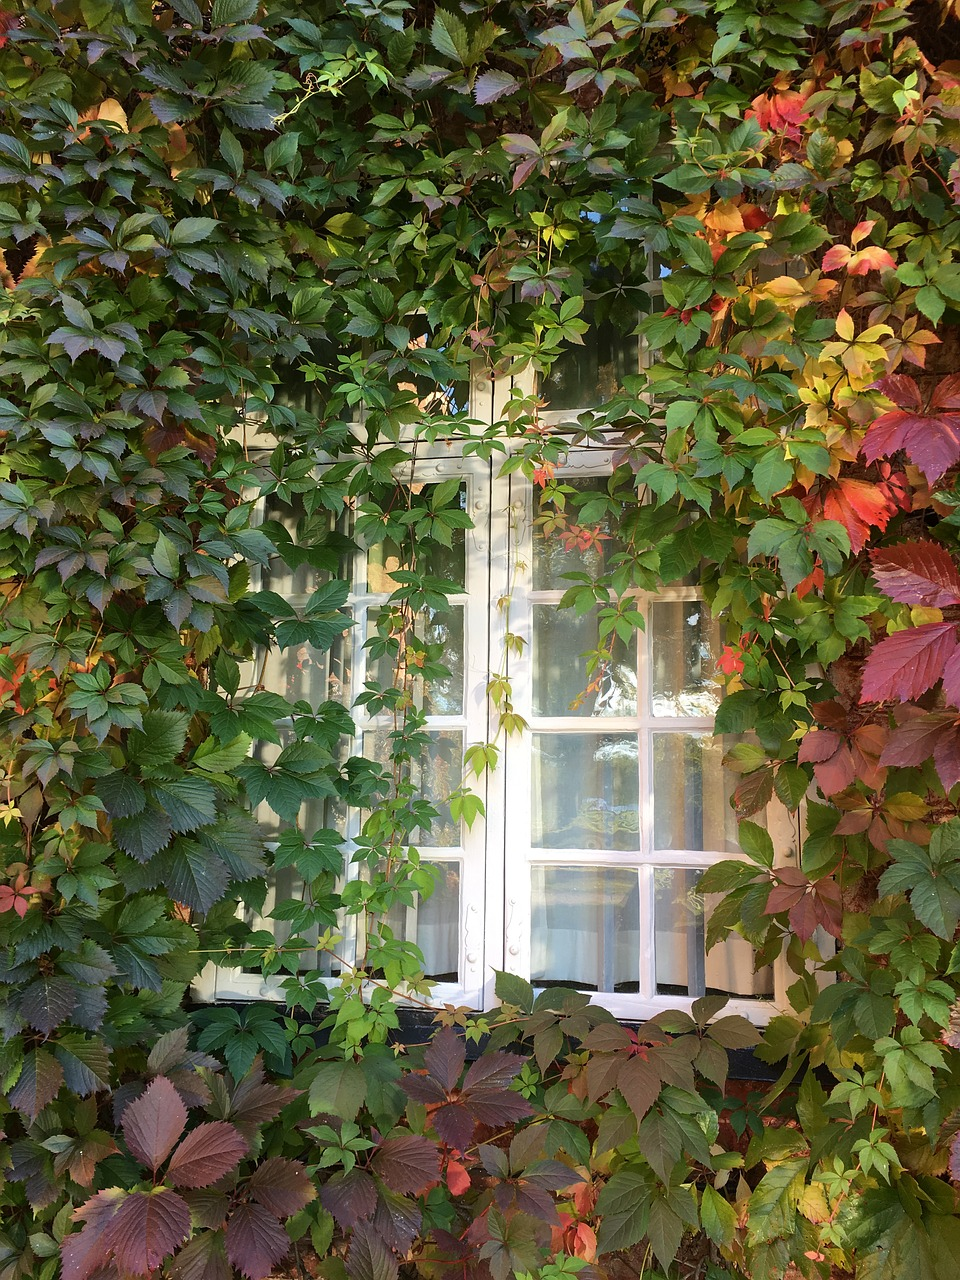 Gardeners Worst Nightmares: 28 Perennials You'll Regret Planting